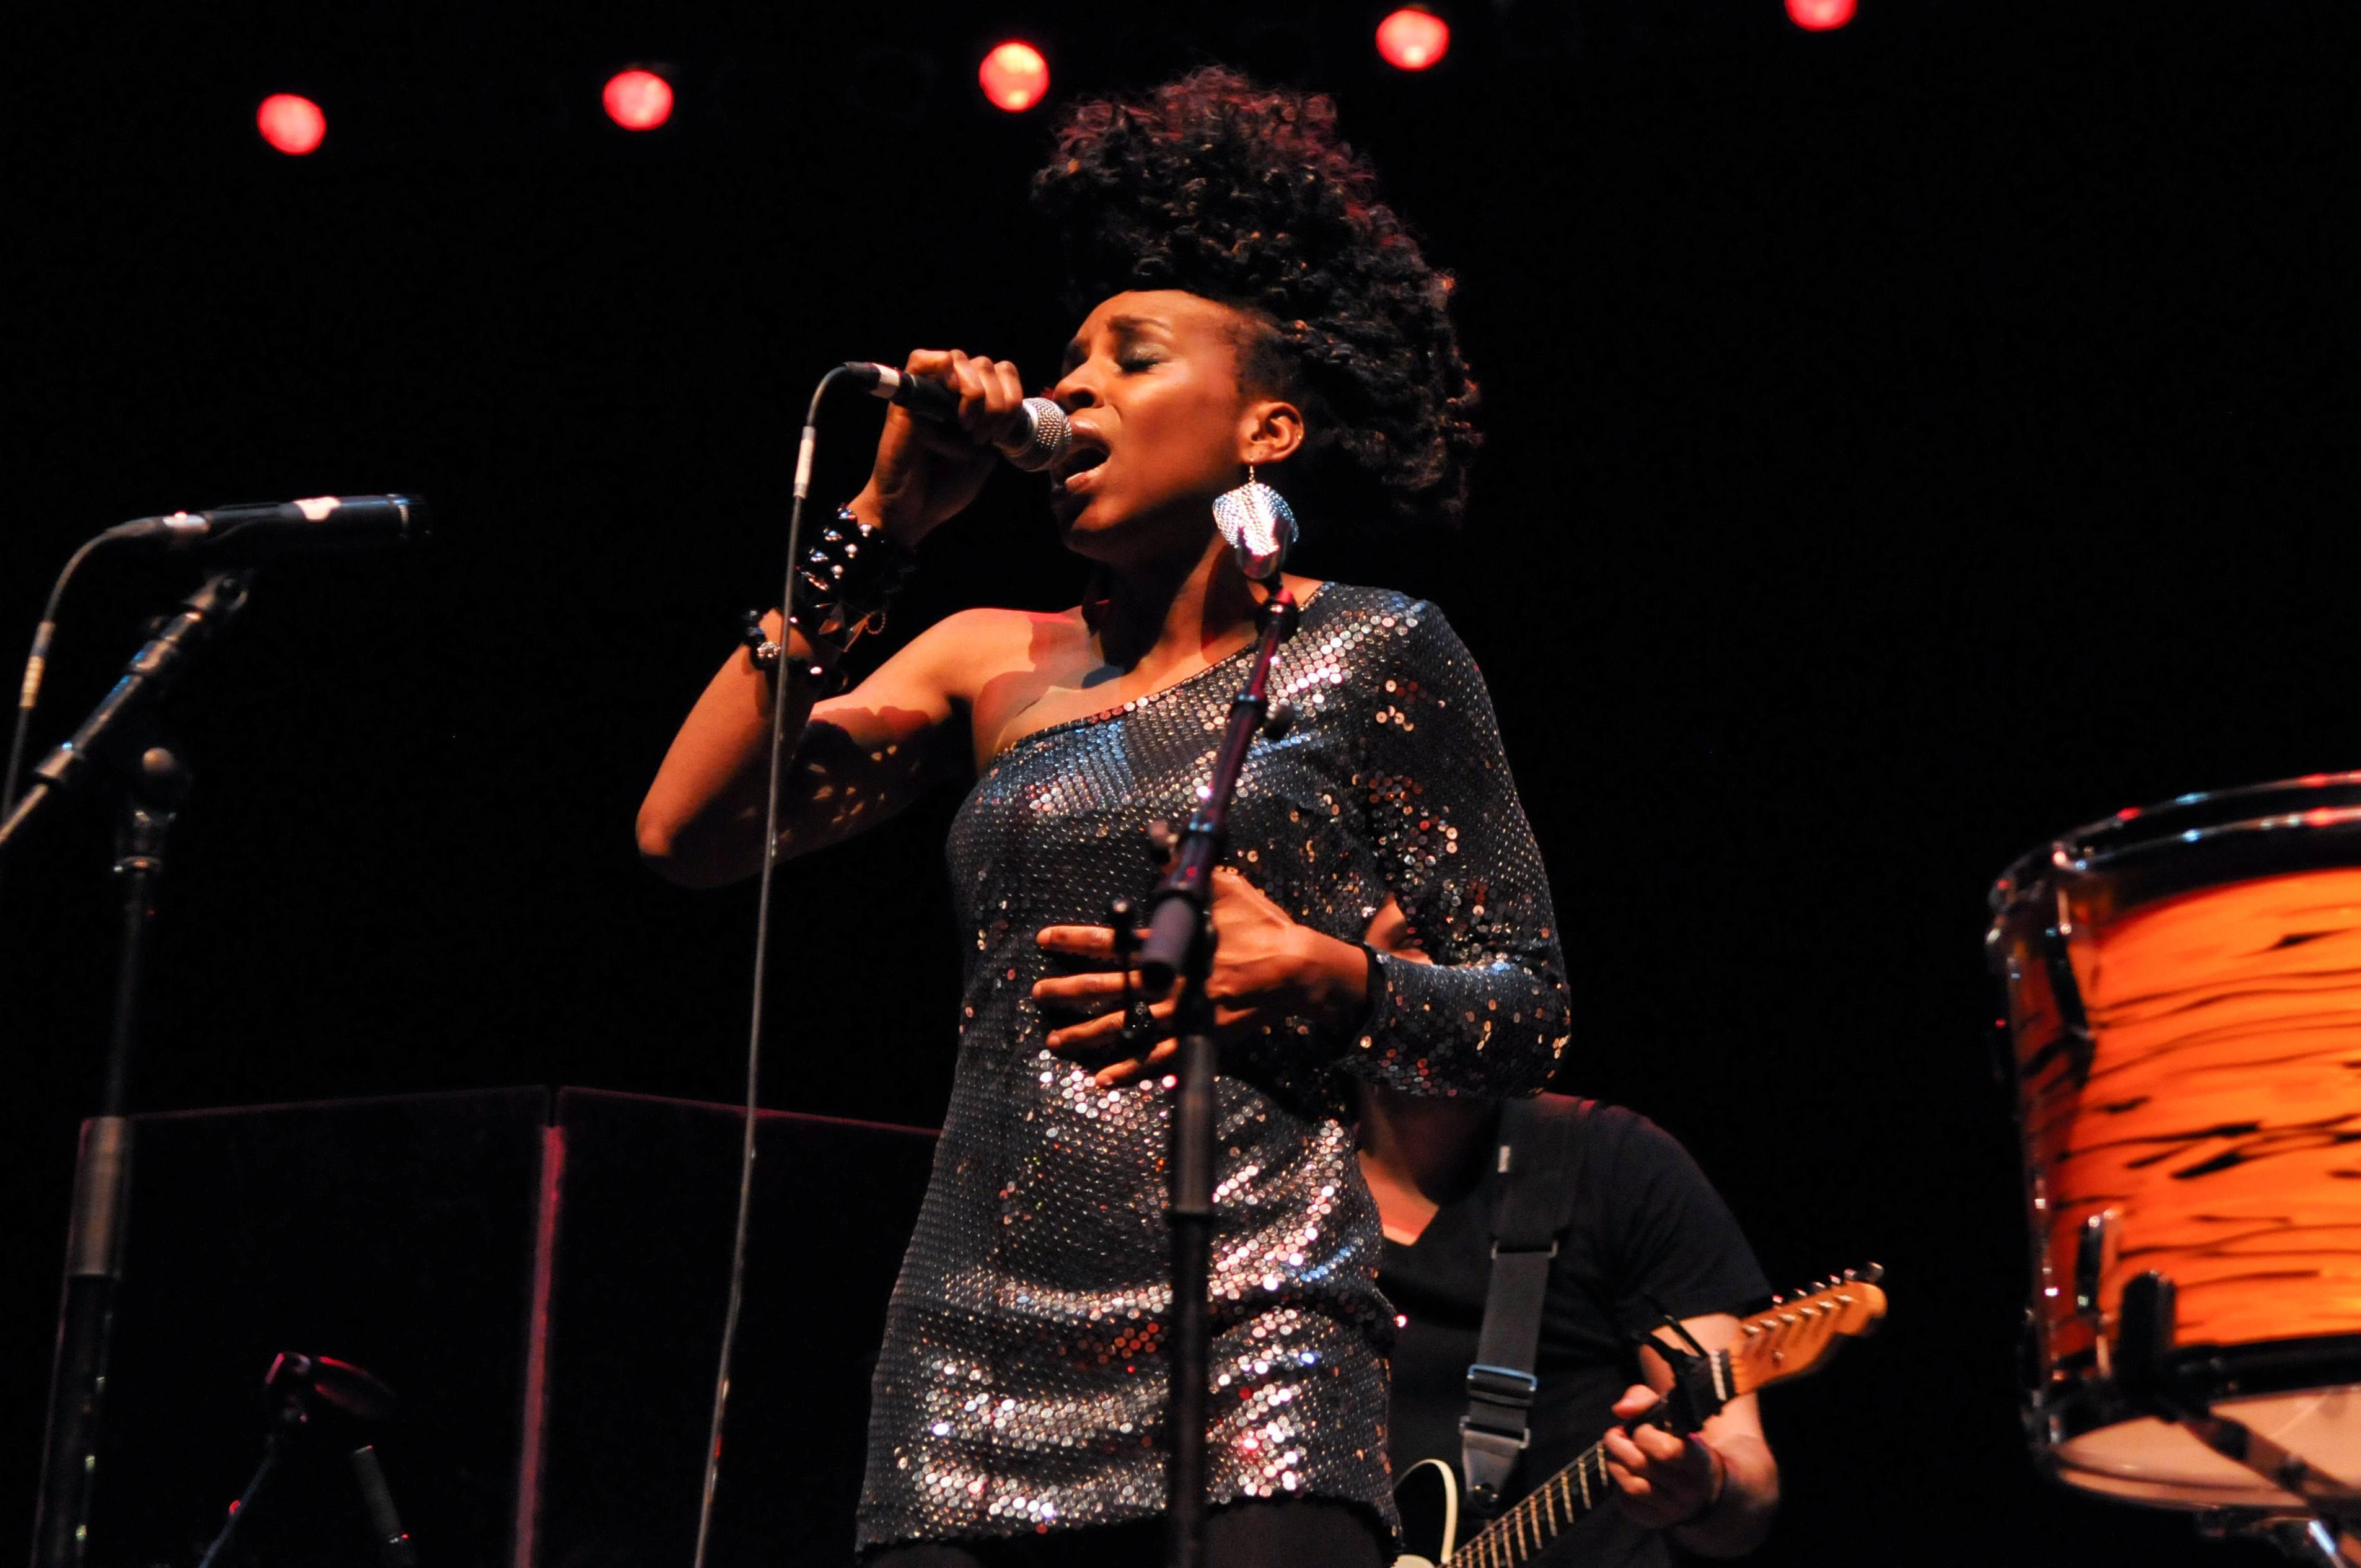 Flo_Performance_Lauryn_Hill_Show2